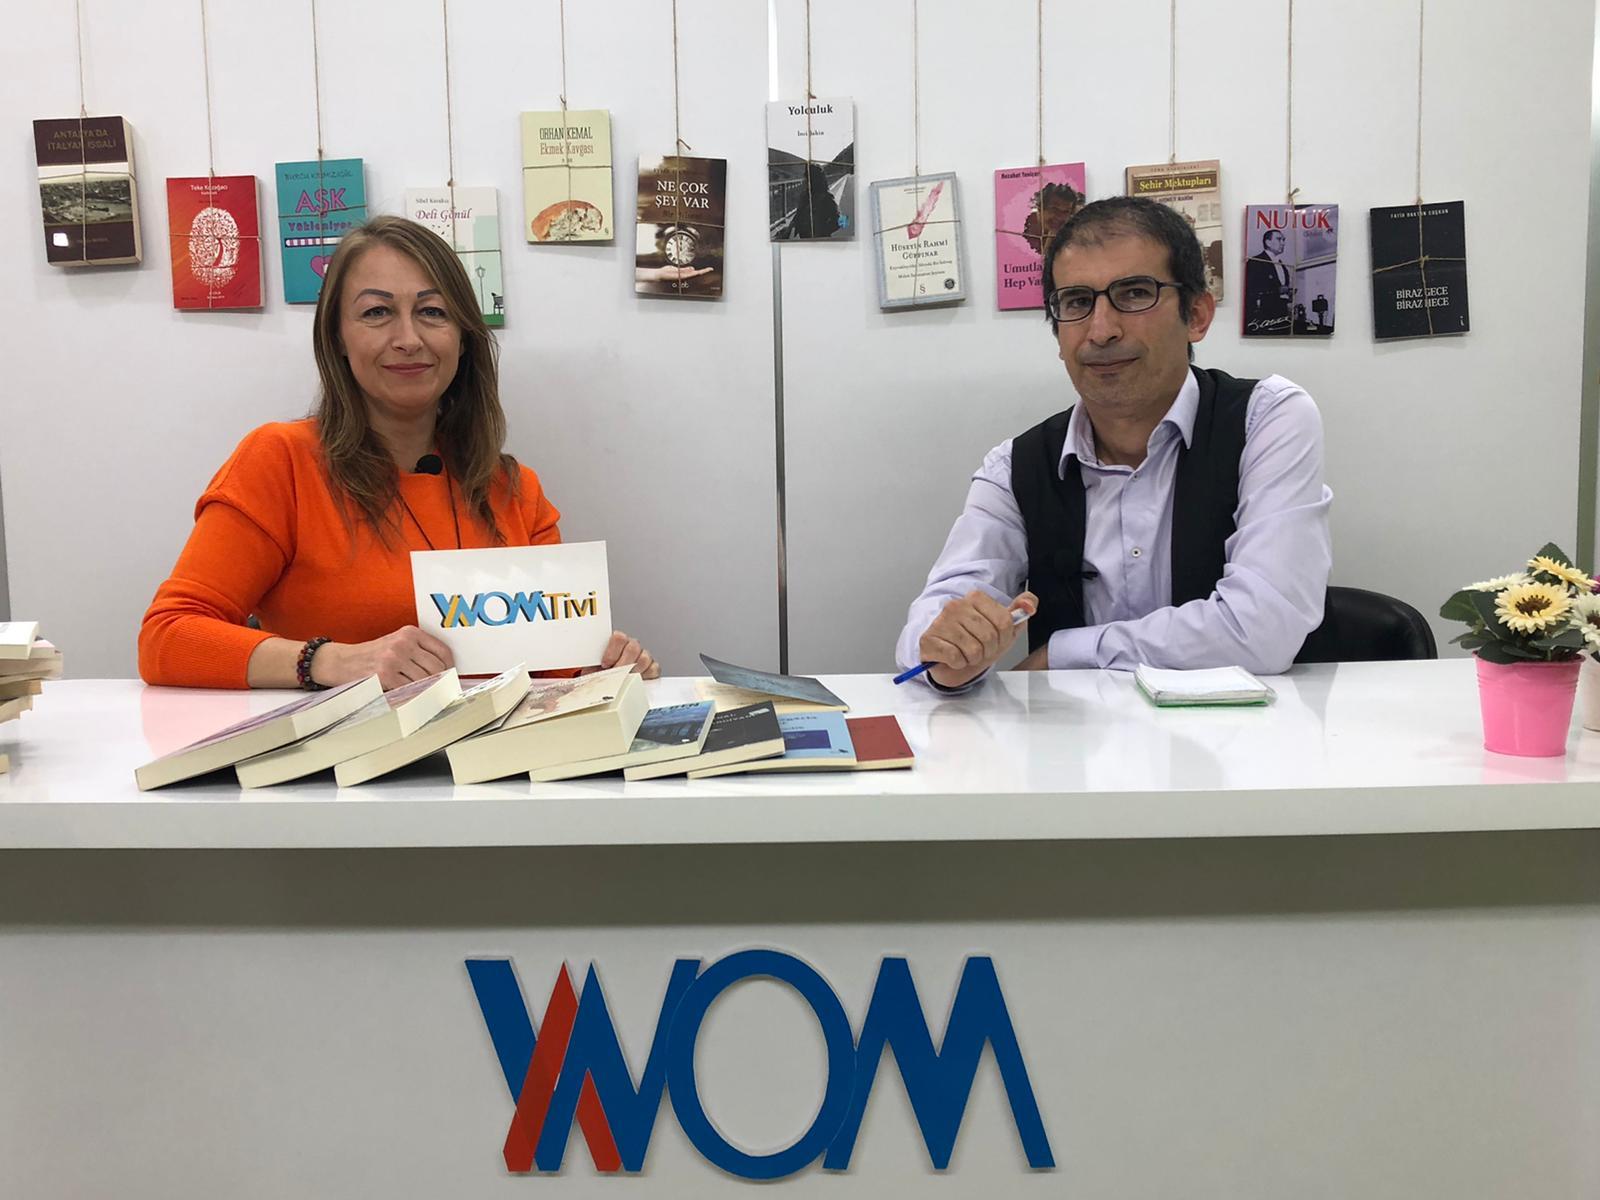 Photo of Editörümüz Şehmus Ay'ın Wom Tivi Söyleşisi